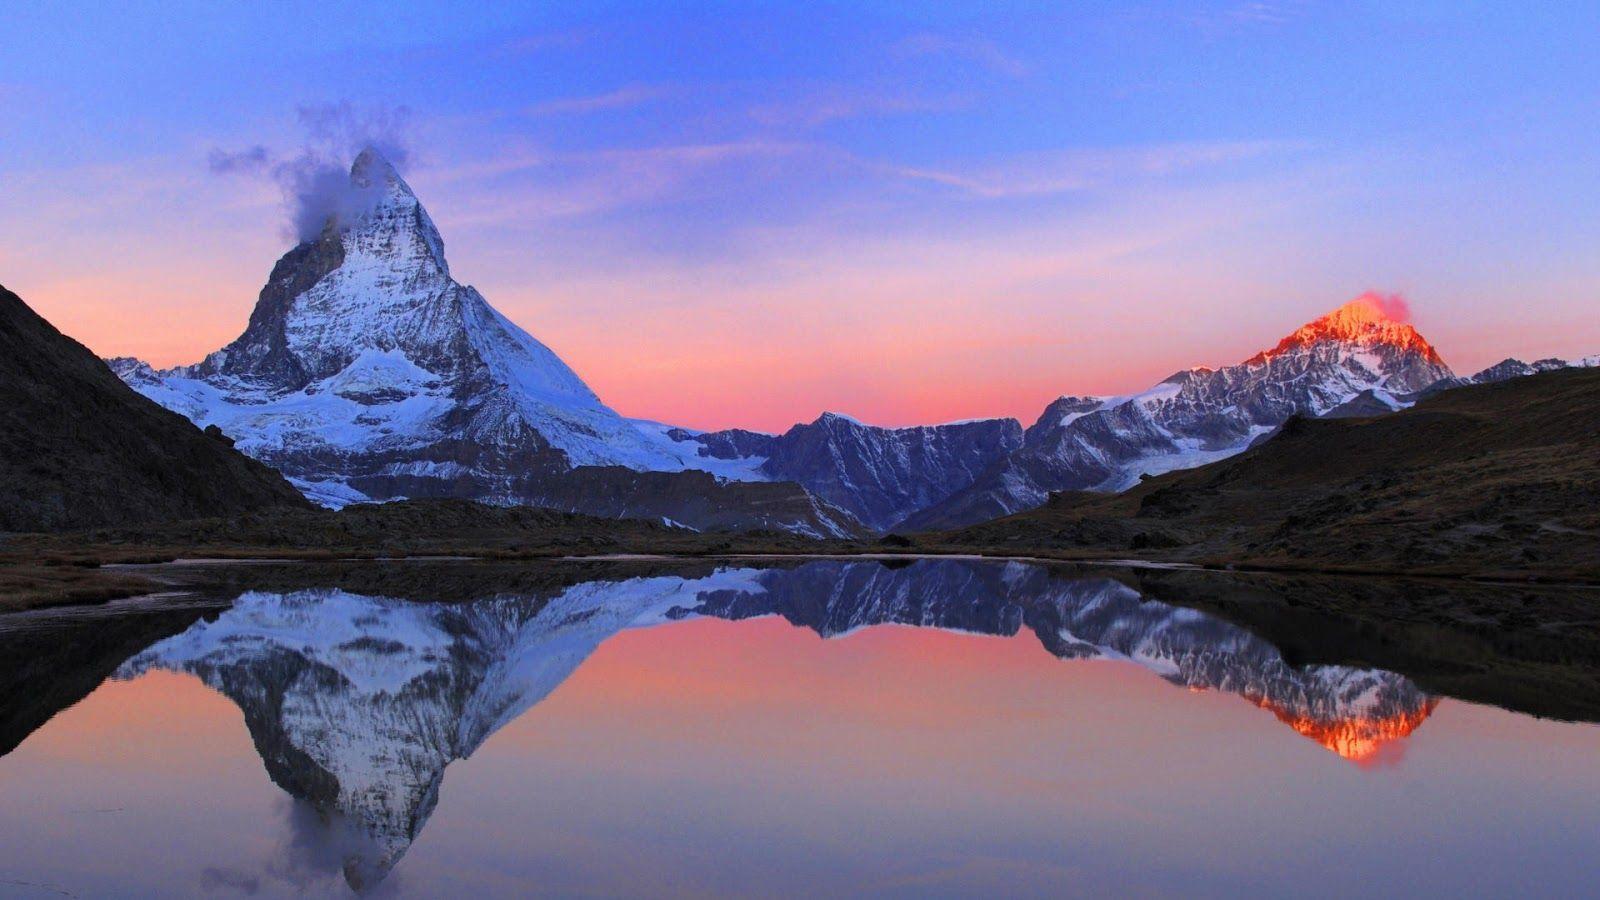 6000 X 4800 Landscape Wallpapers Top Free 6000 X 4800 Landscape Backgrounds Wallpaperaccess